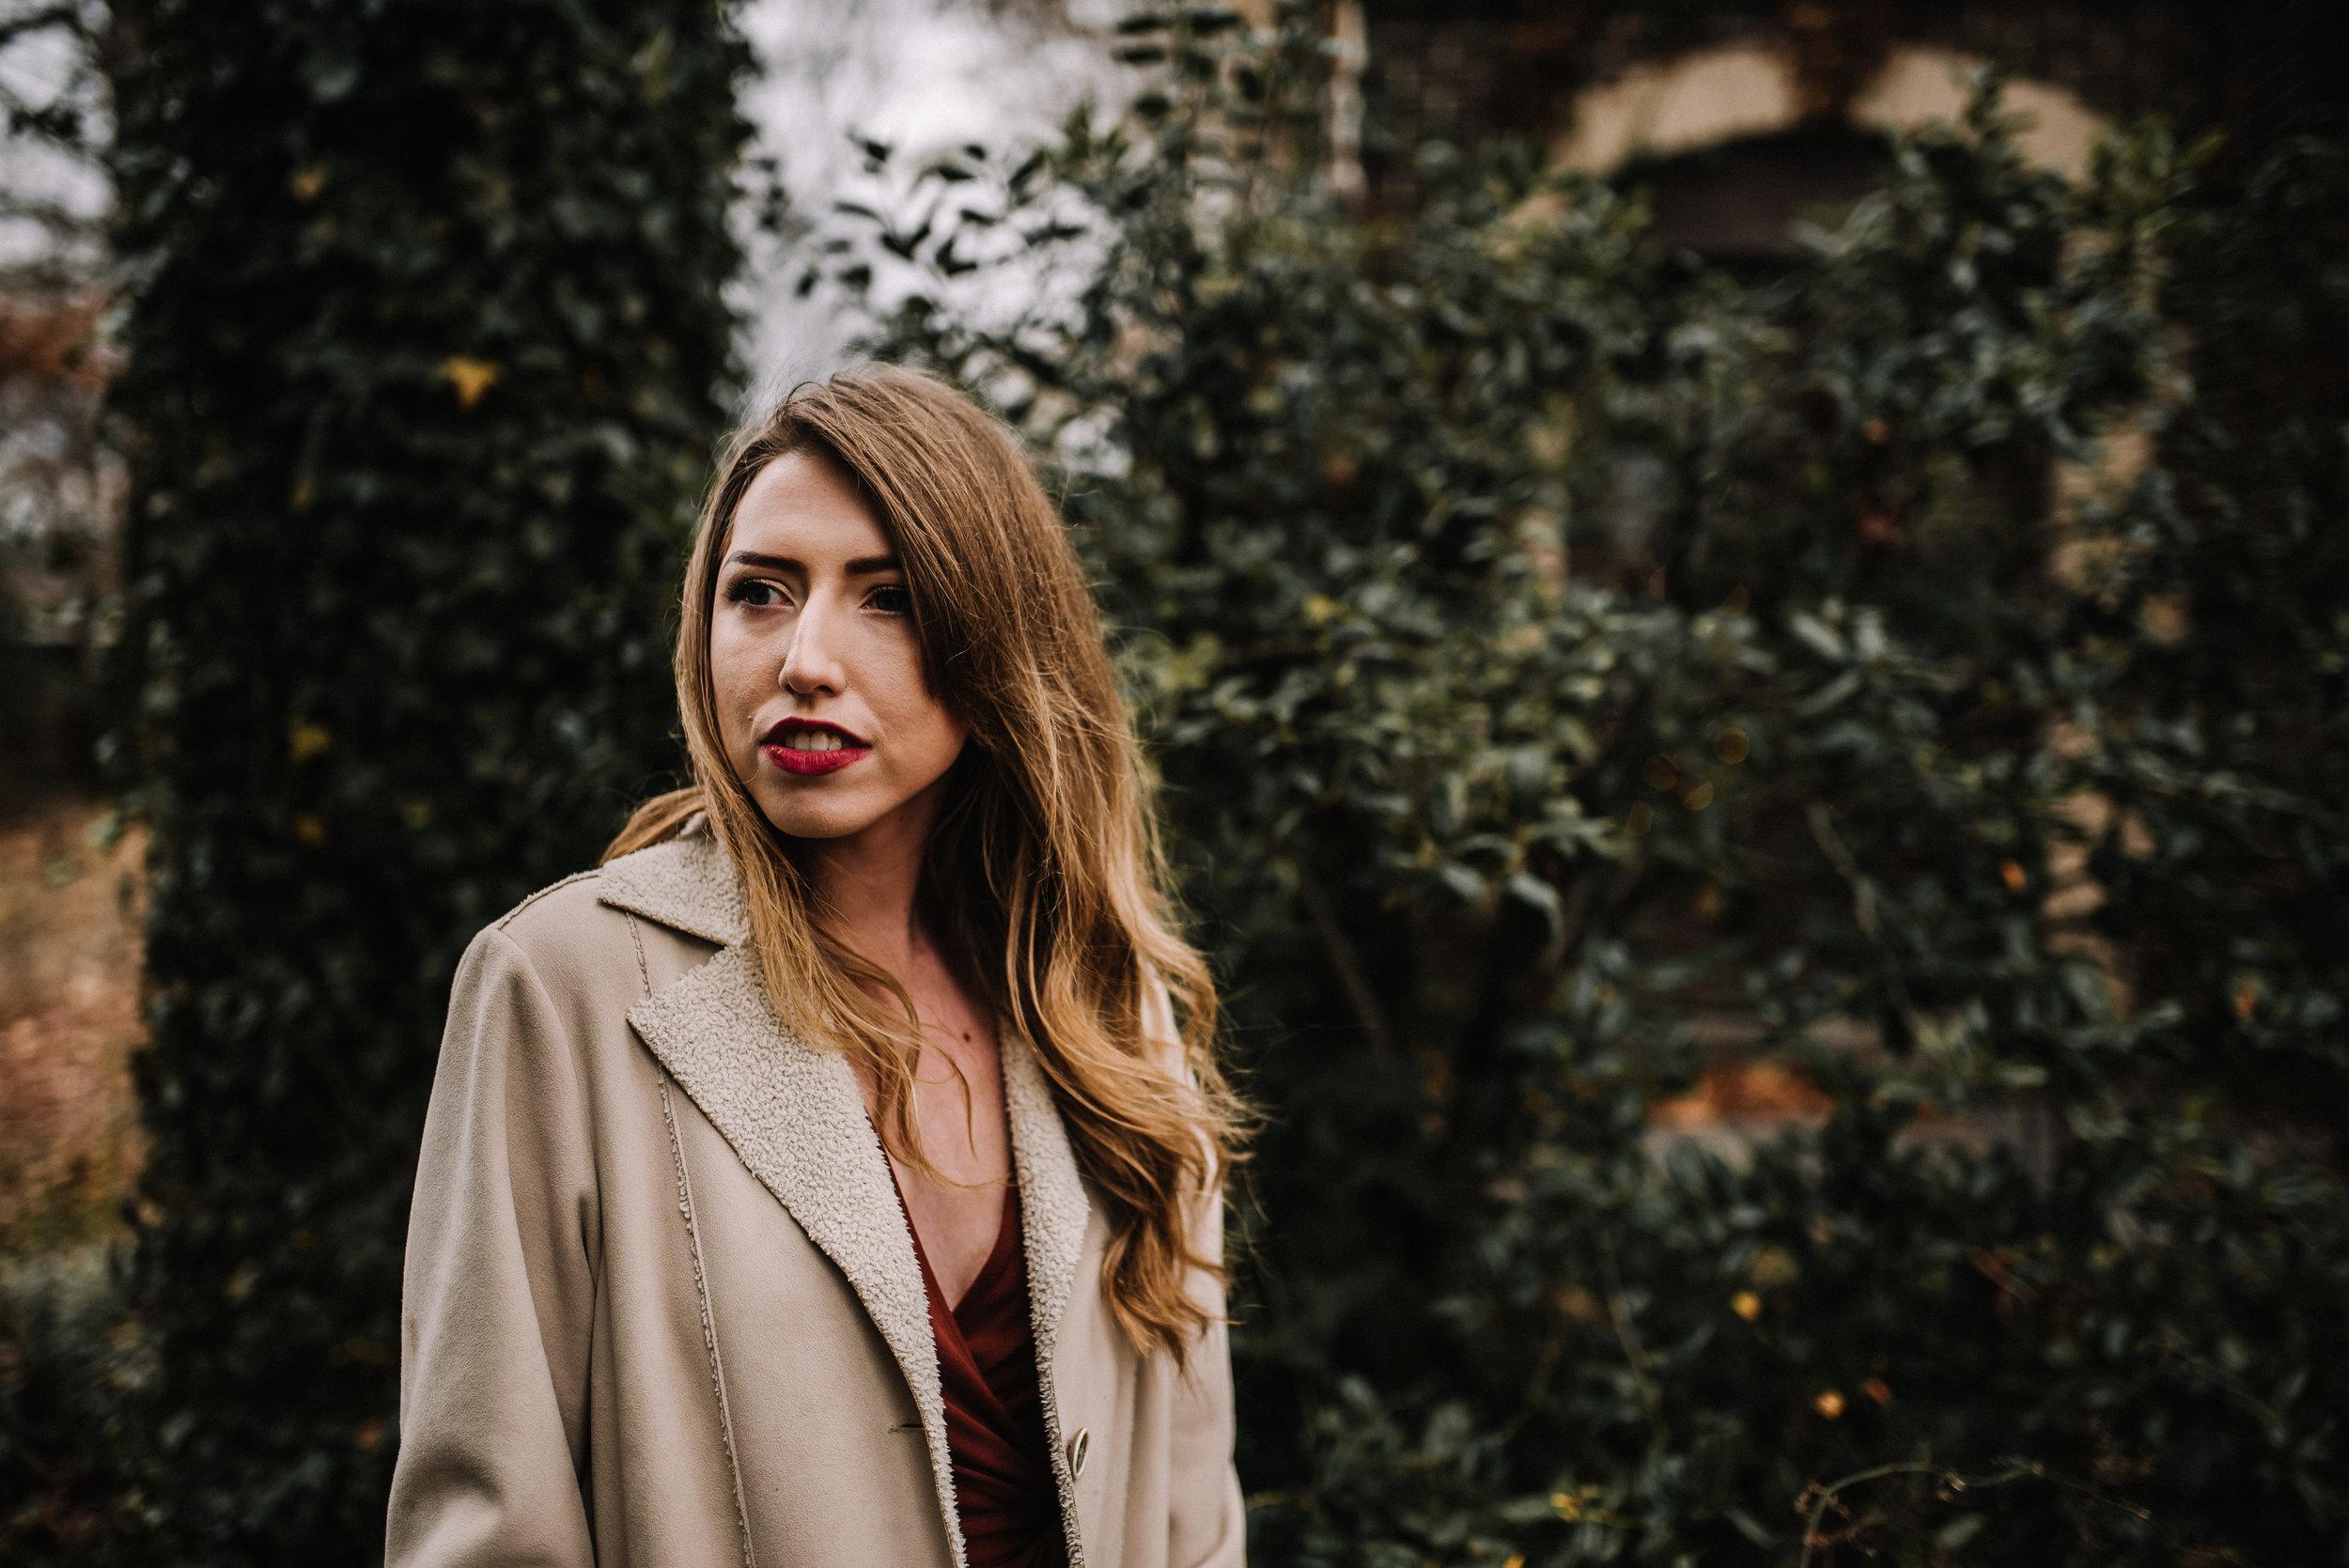 Kaitlyn_Ashley-Benham-Photography-51.jpg